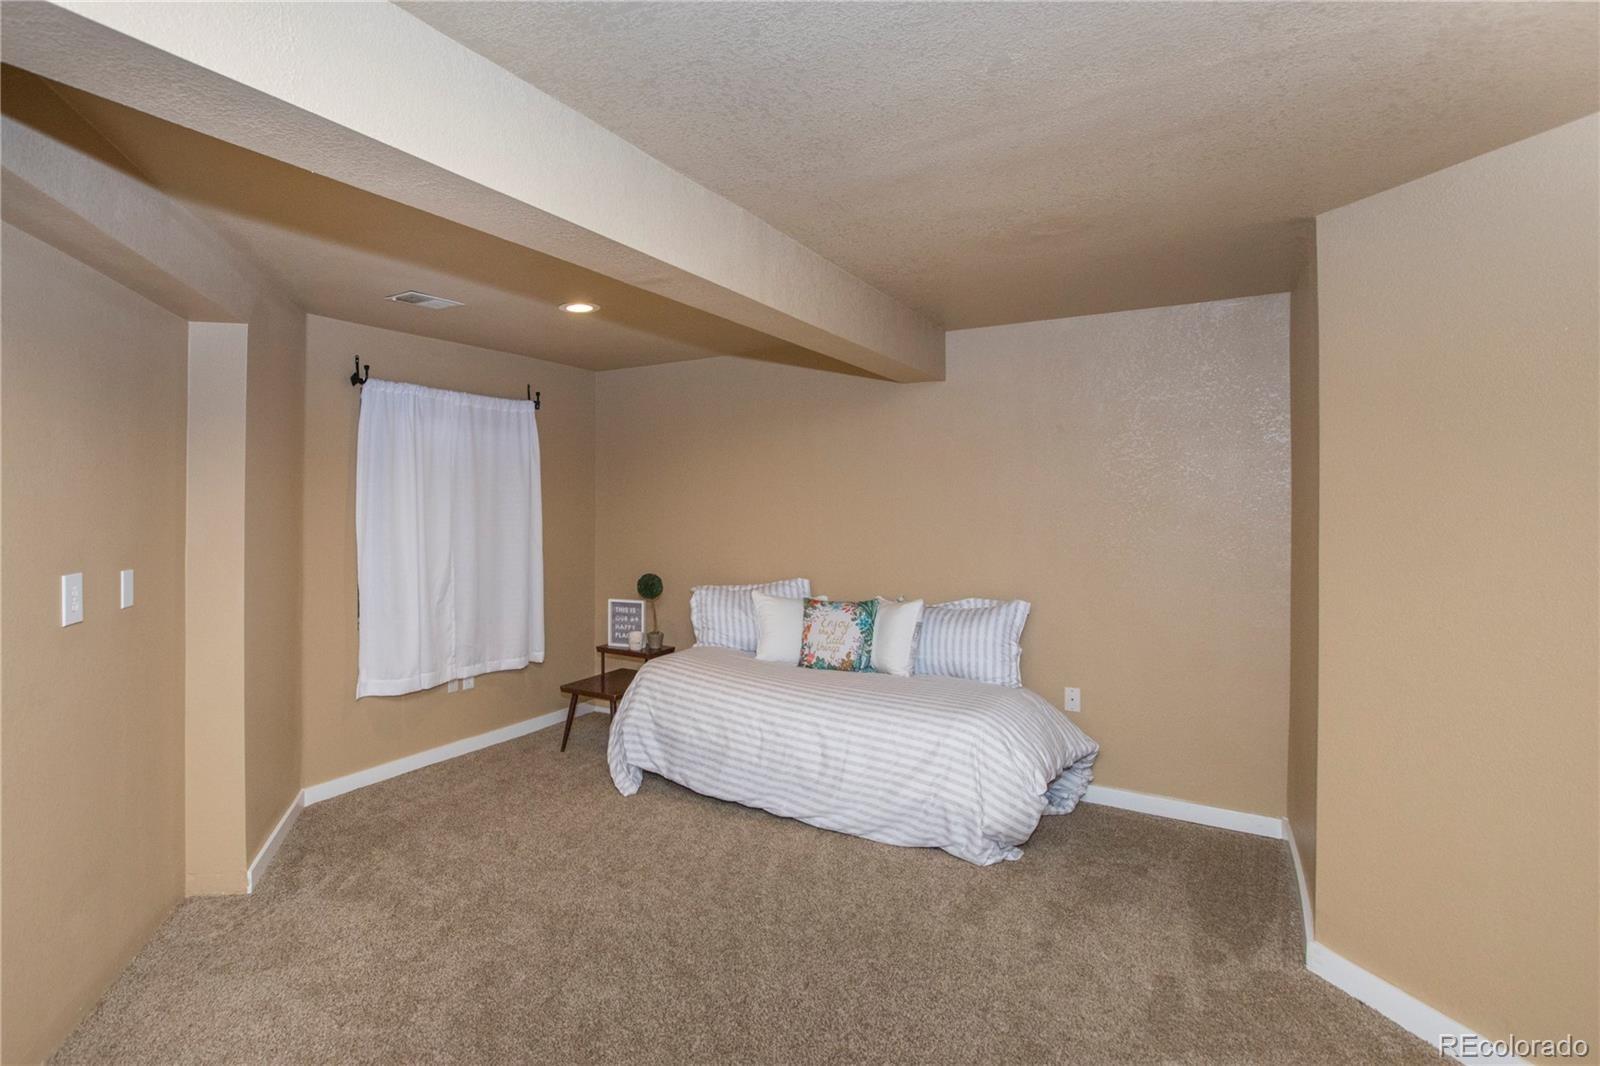 MLS# 3758449 - 27 - 6802 Antigua Drive #26, Fort Collins, CO 80525